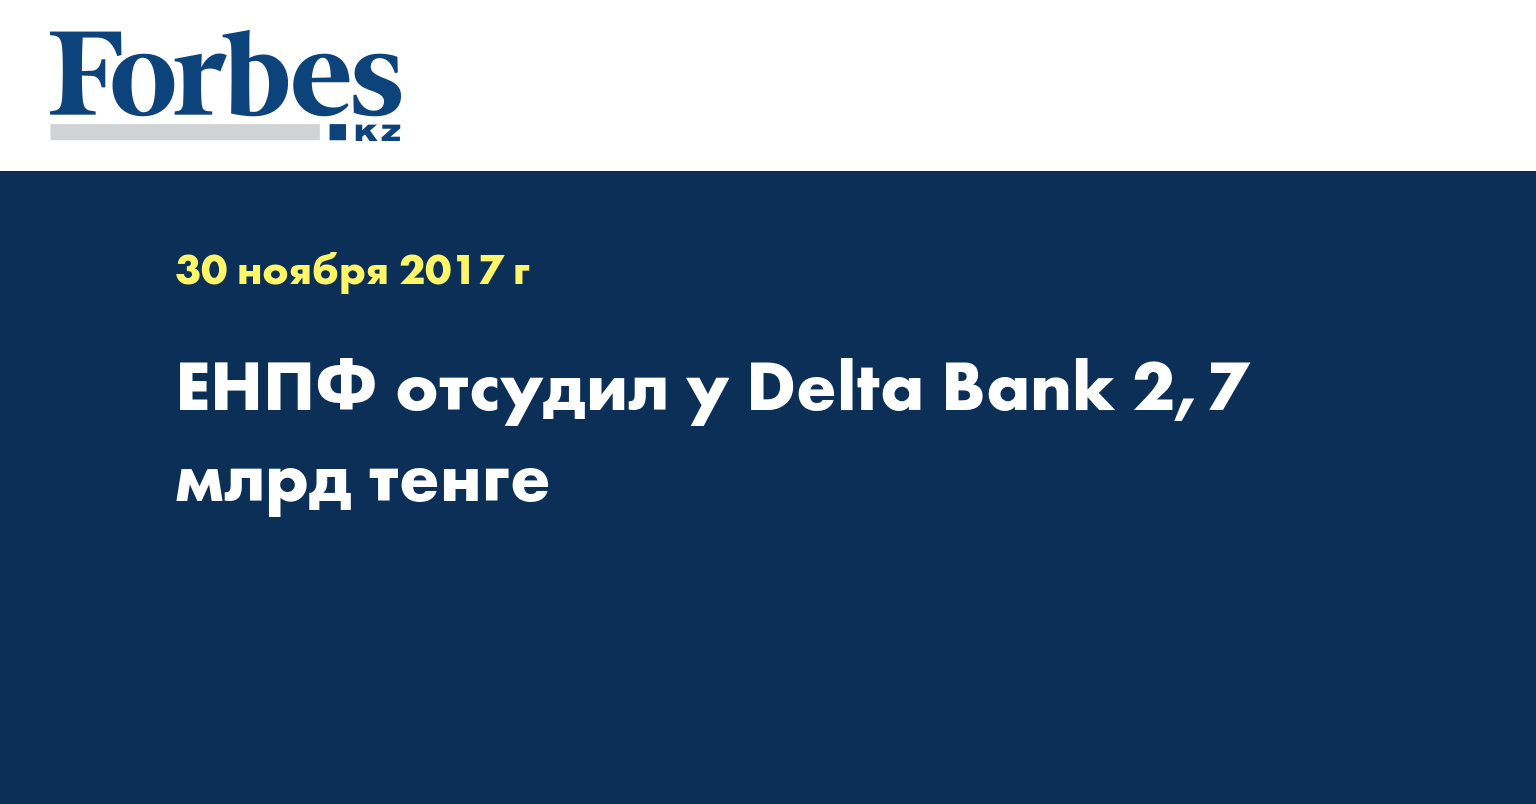 ЕНПФ отсудил у Delta Bank 2,7 млрд тенге